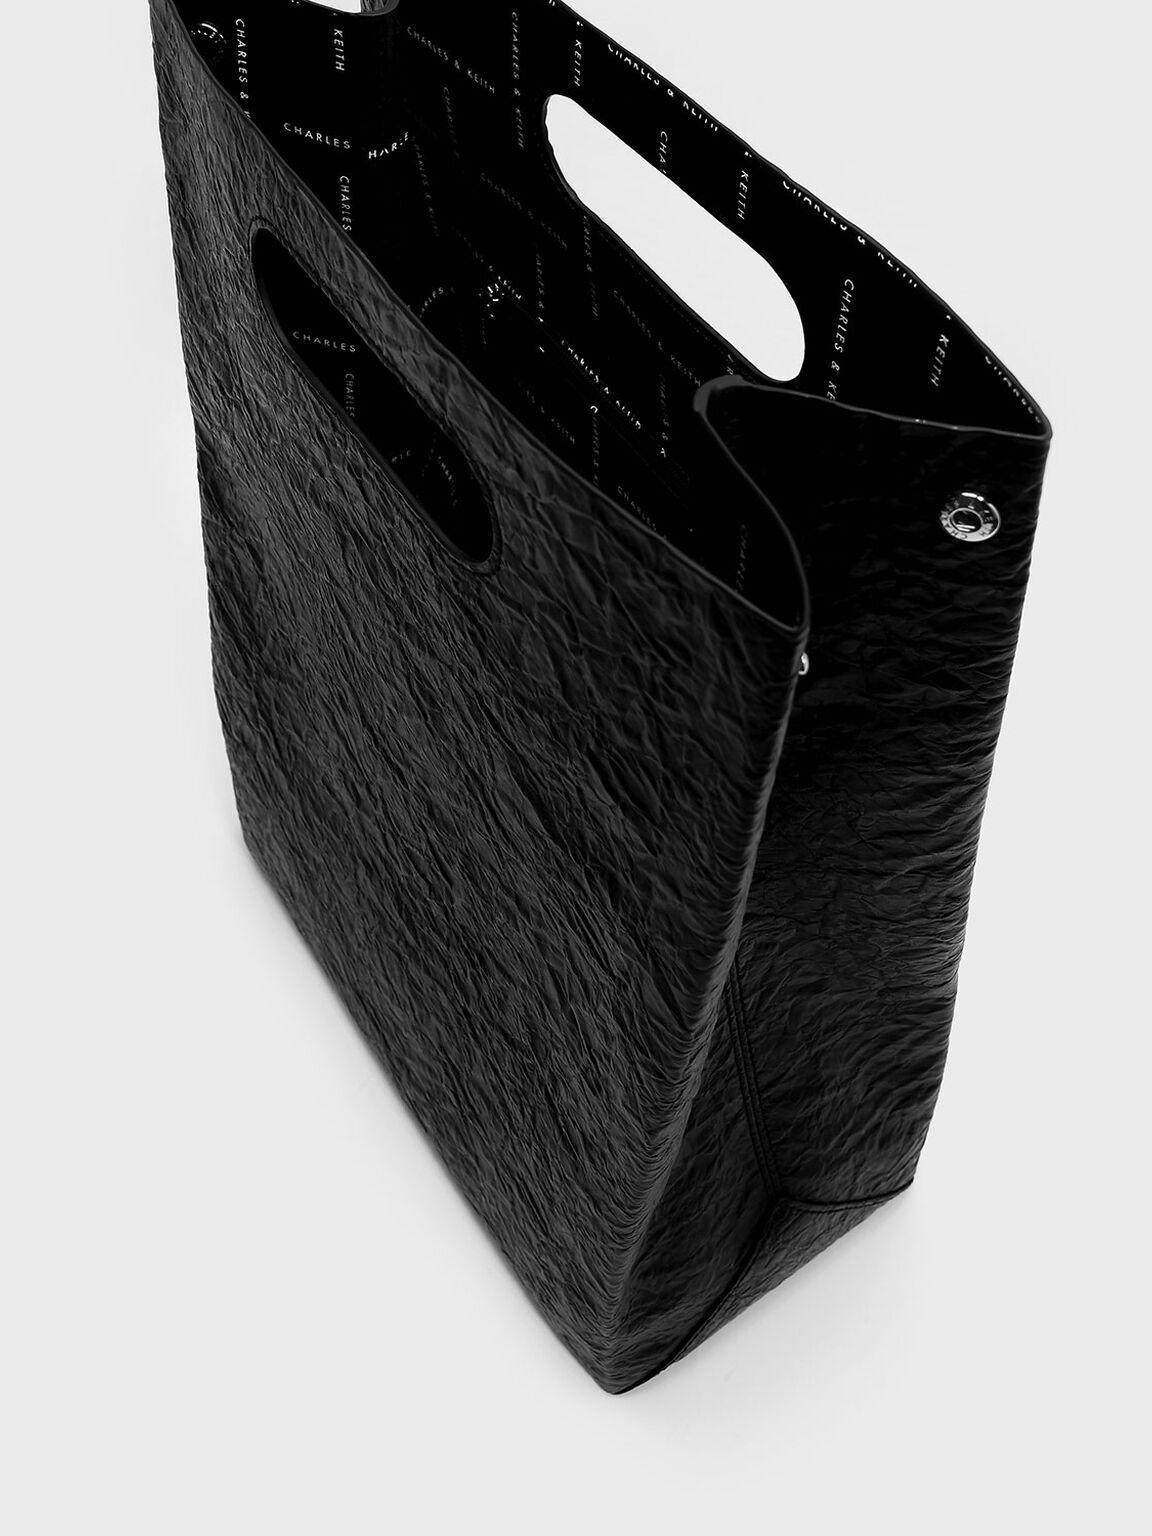 Cut Out Handle Structured Bag, Black, hi-res